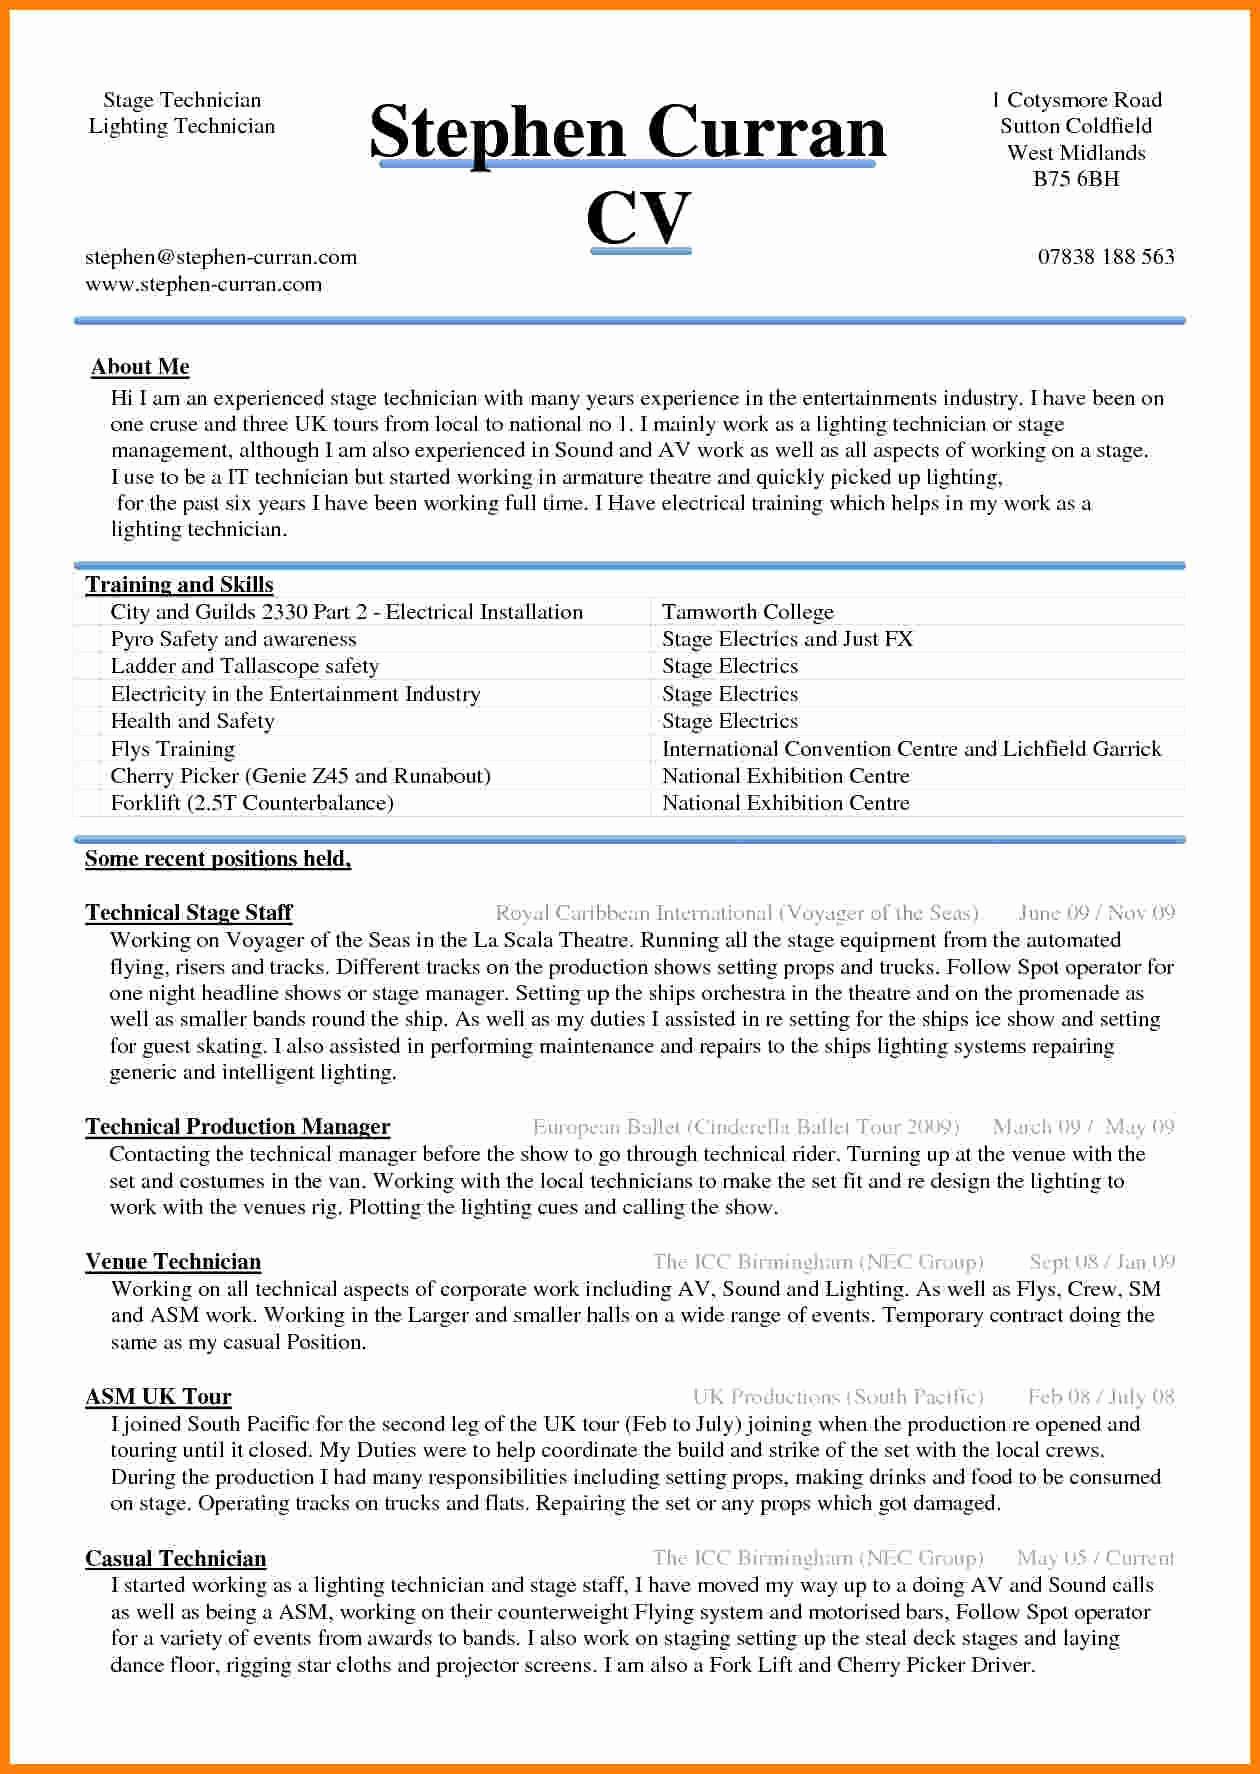 Free Curriculum Vitae Template Word Best Of 5 Cv Sample Word Document